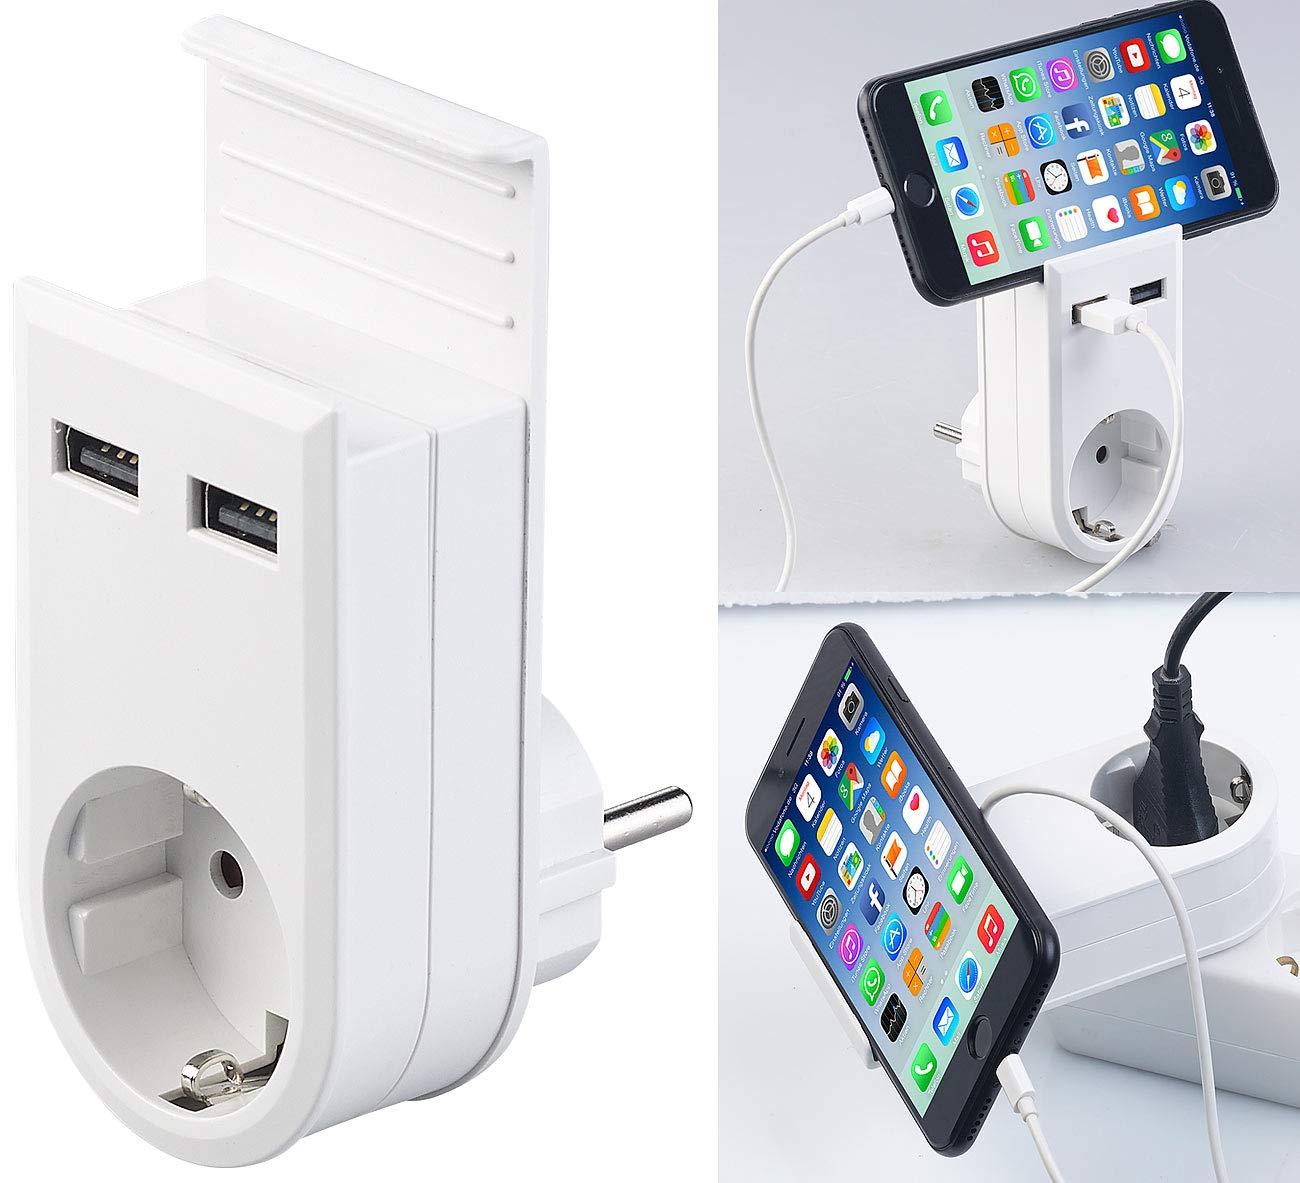 revolt USB Ladegerä te: Steckdose mit Doppel-USB-Netzteil & Smartphone-Ablage, 3,4 A/ 17 Watt (Multi-USB-Ladestation)